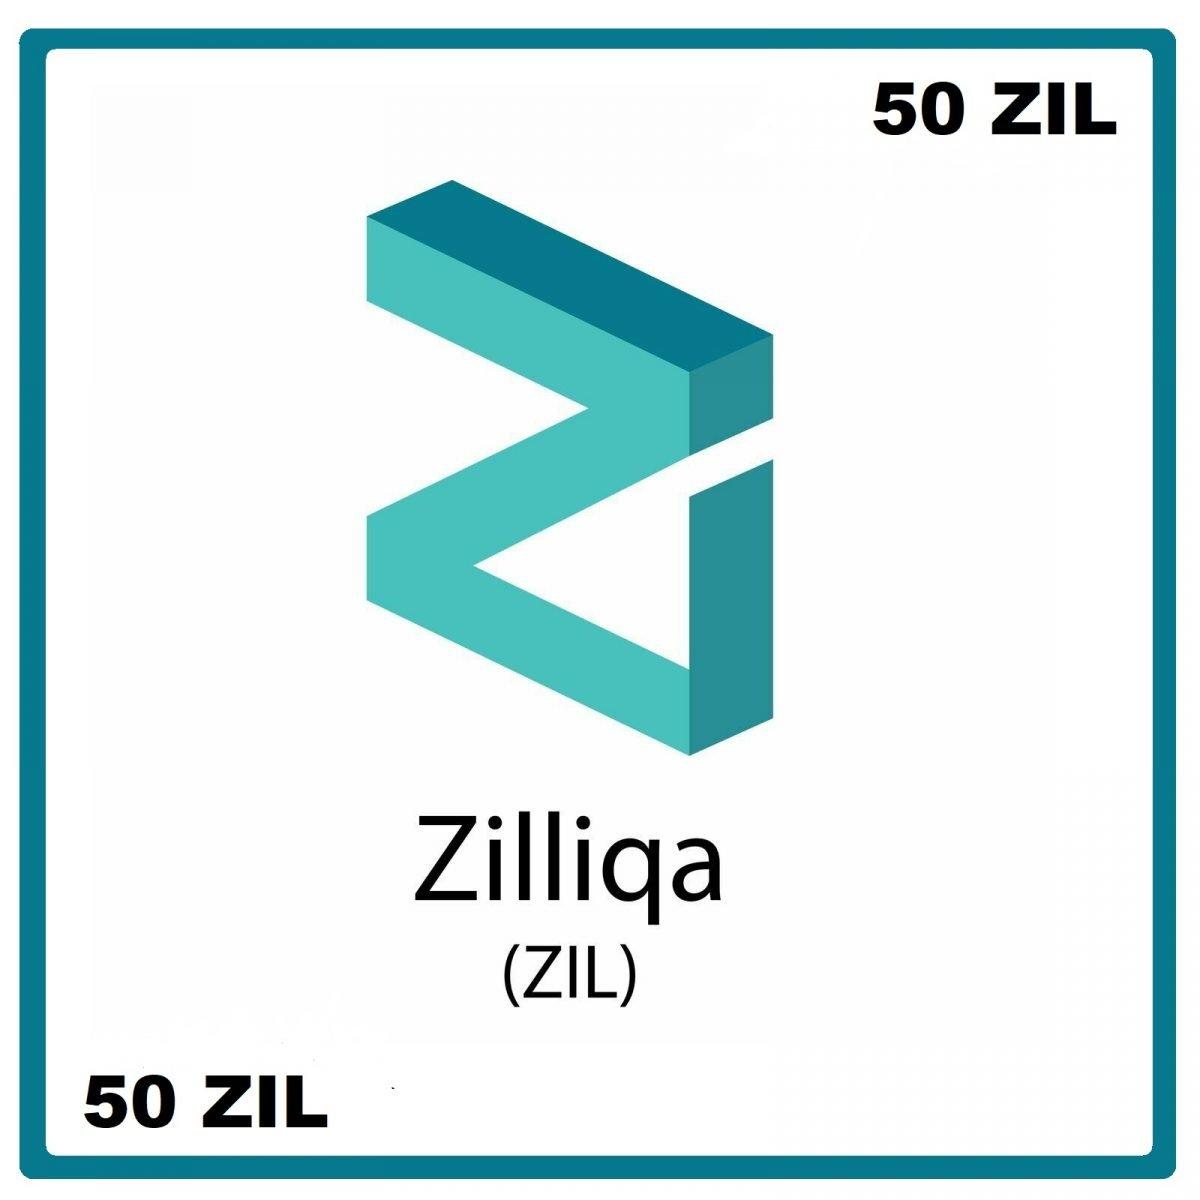 50 Zilliqa Mining Contract